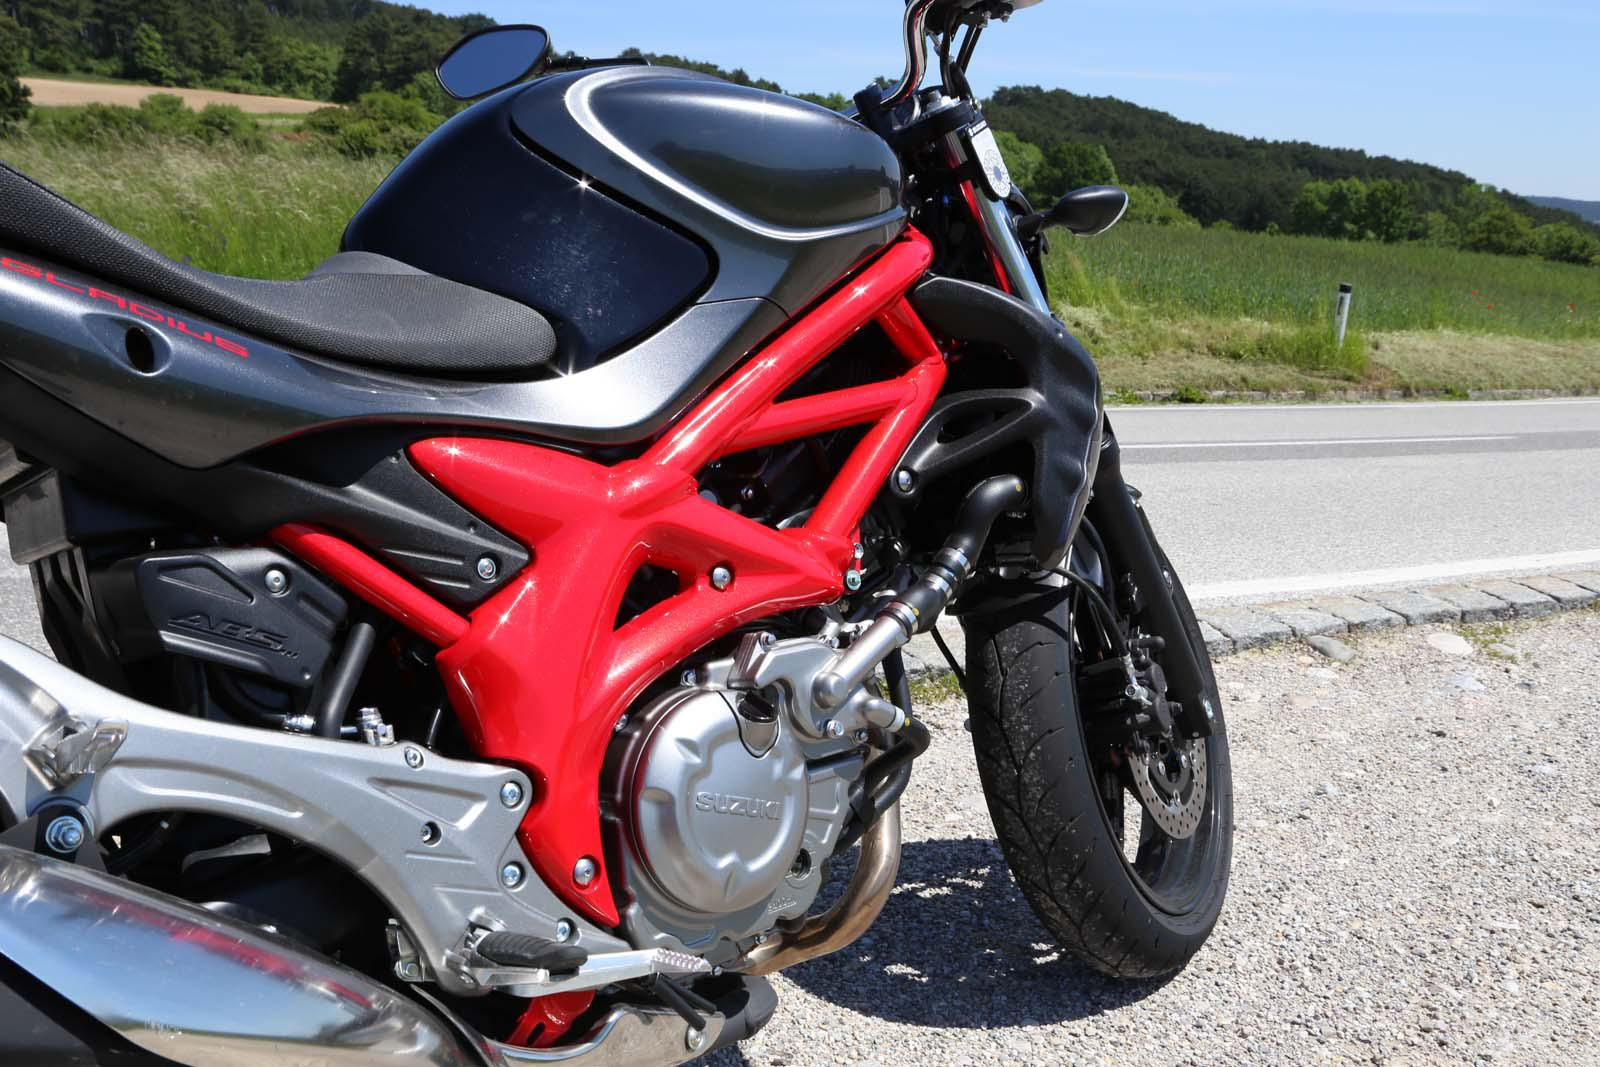 http://www.motorrad-bilder.at/slideshows/291/011178/NakedbikeTestAuswahl6.jpg